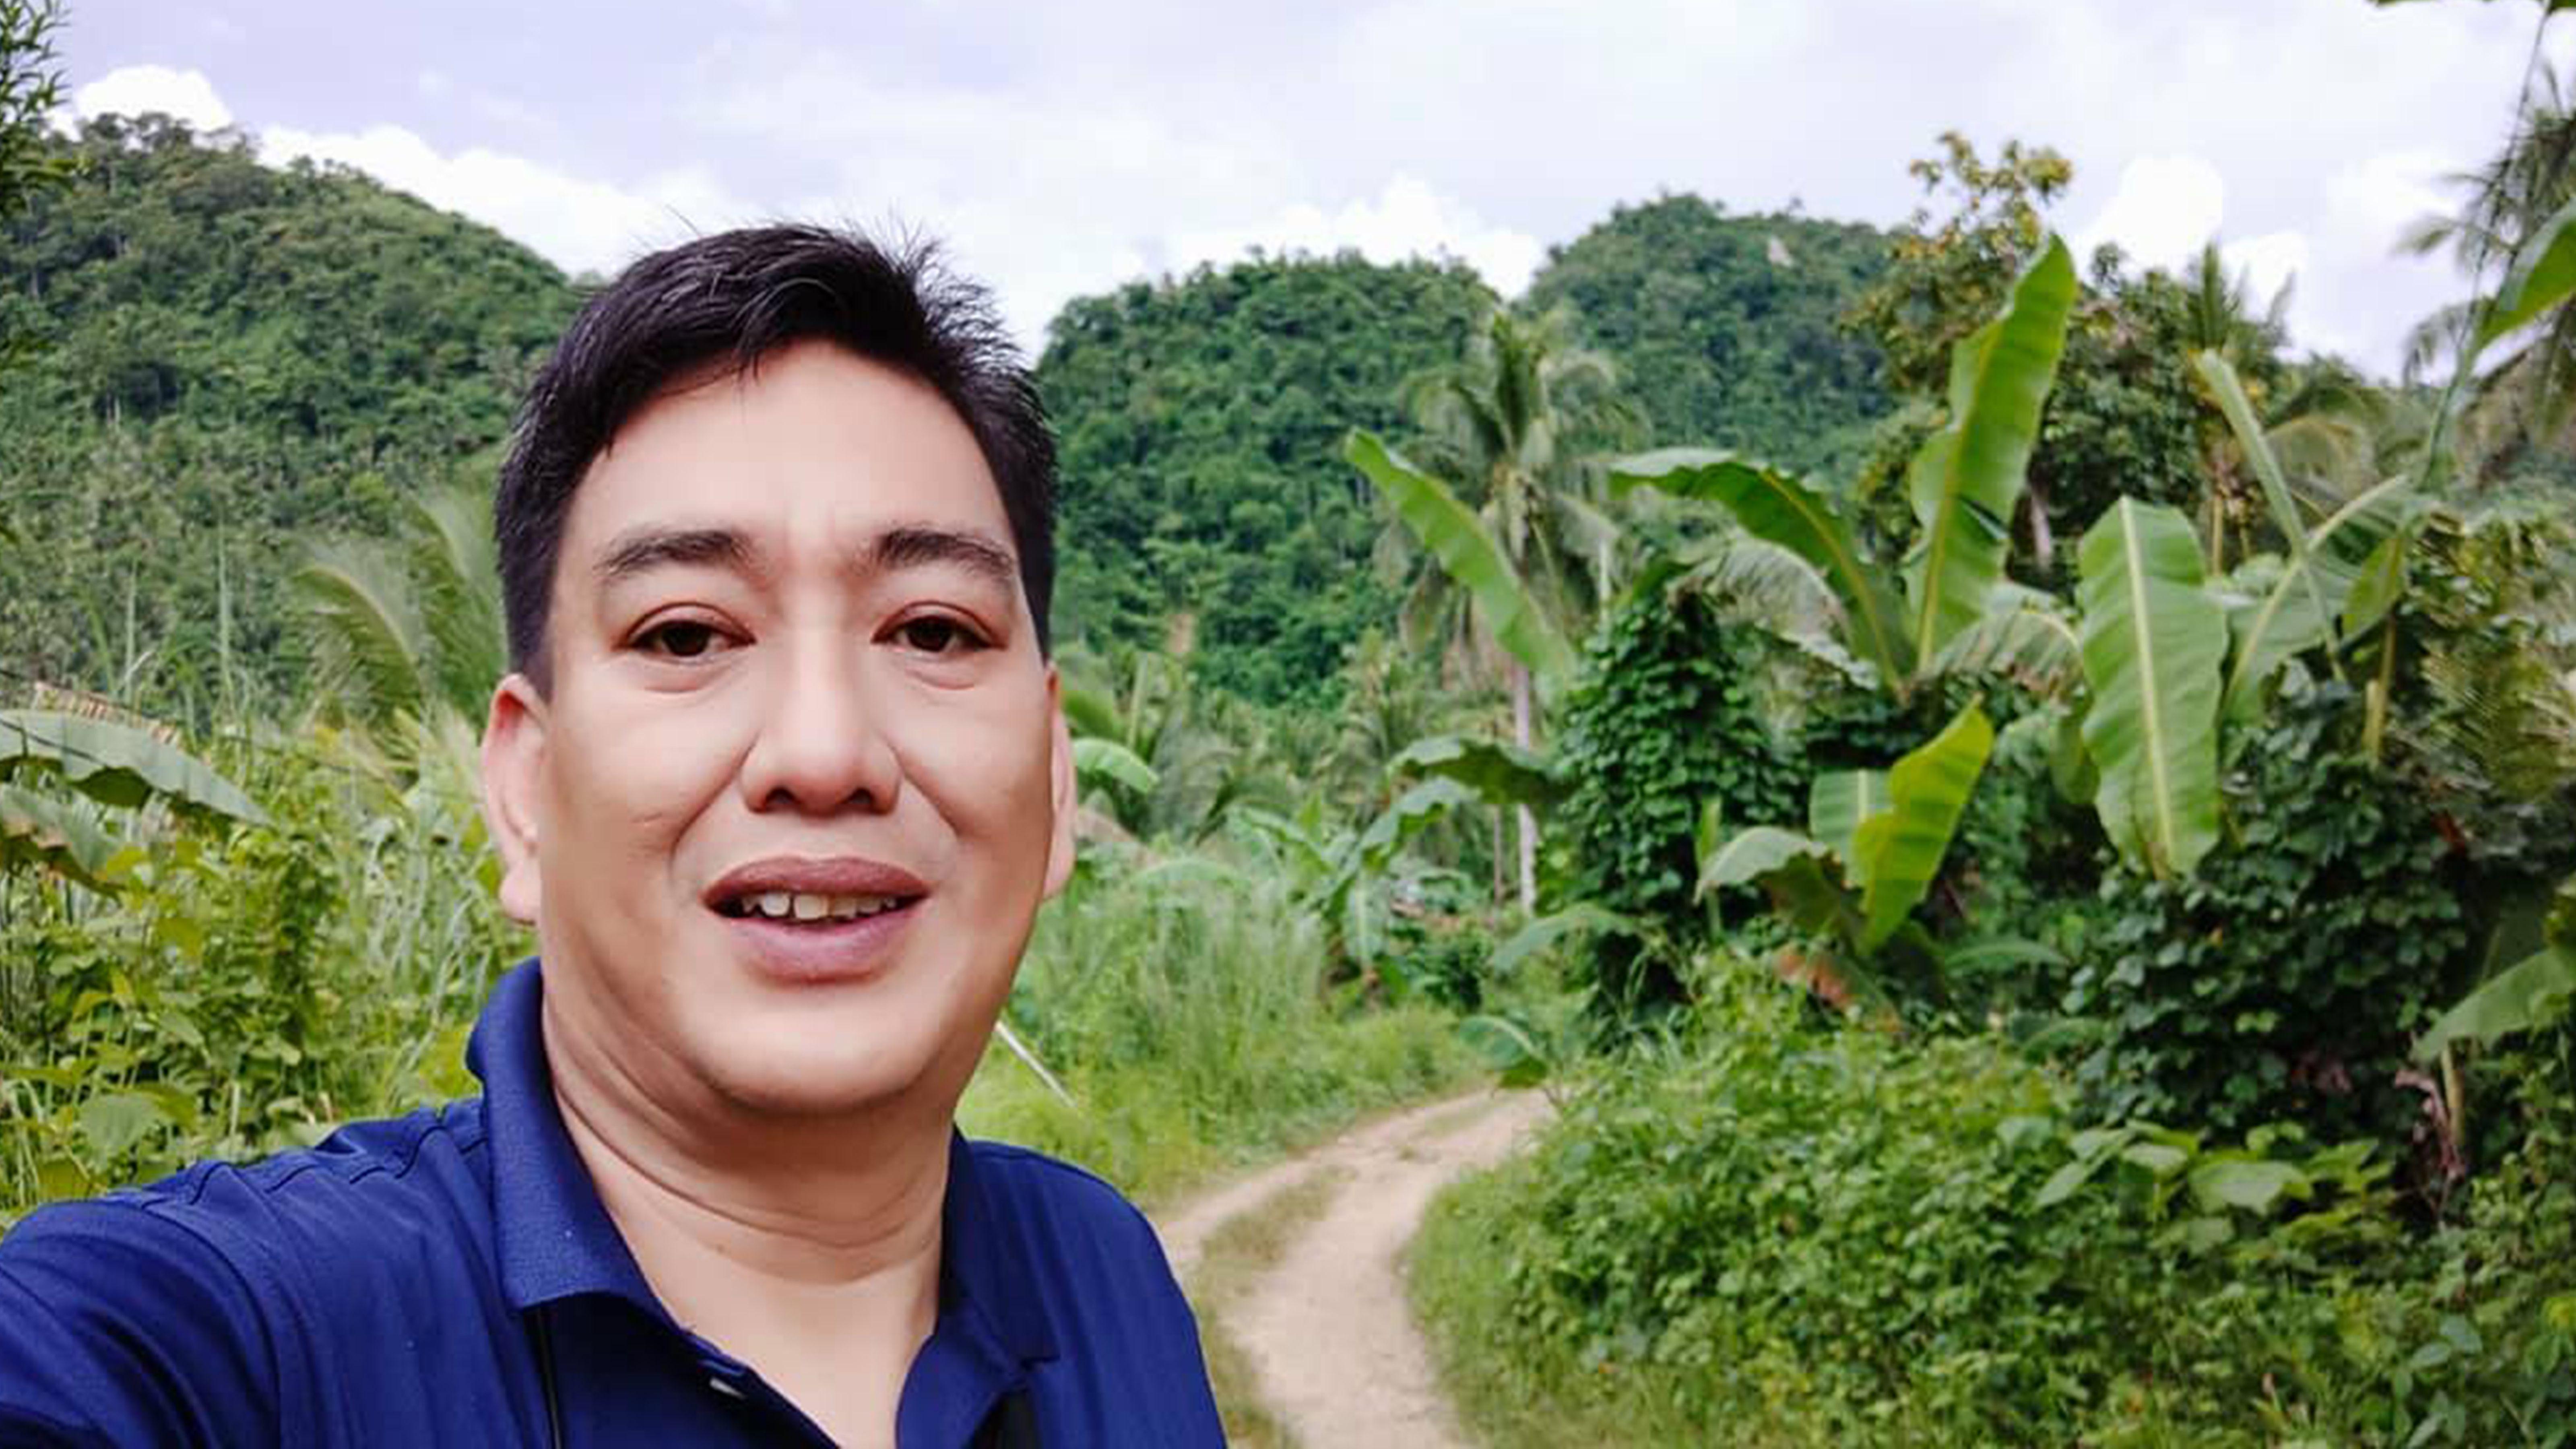 Quezon Province show business and vice-versa